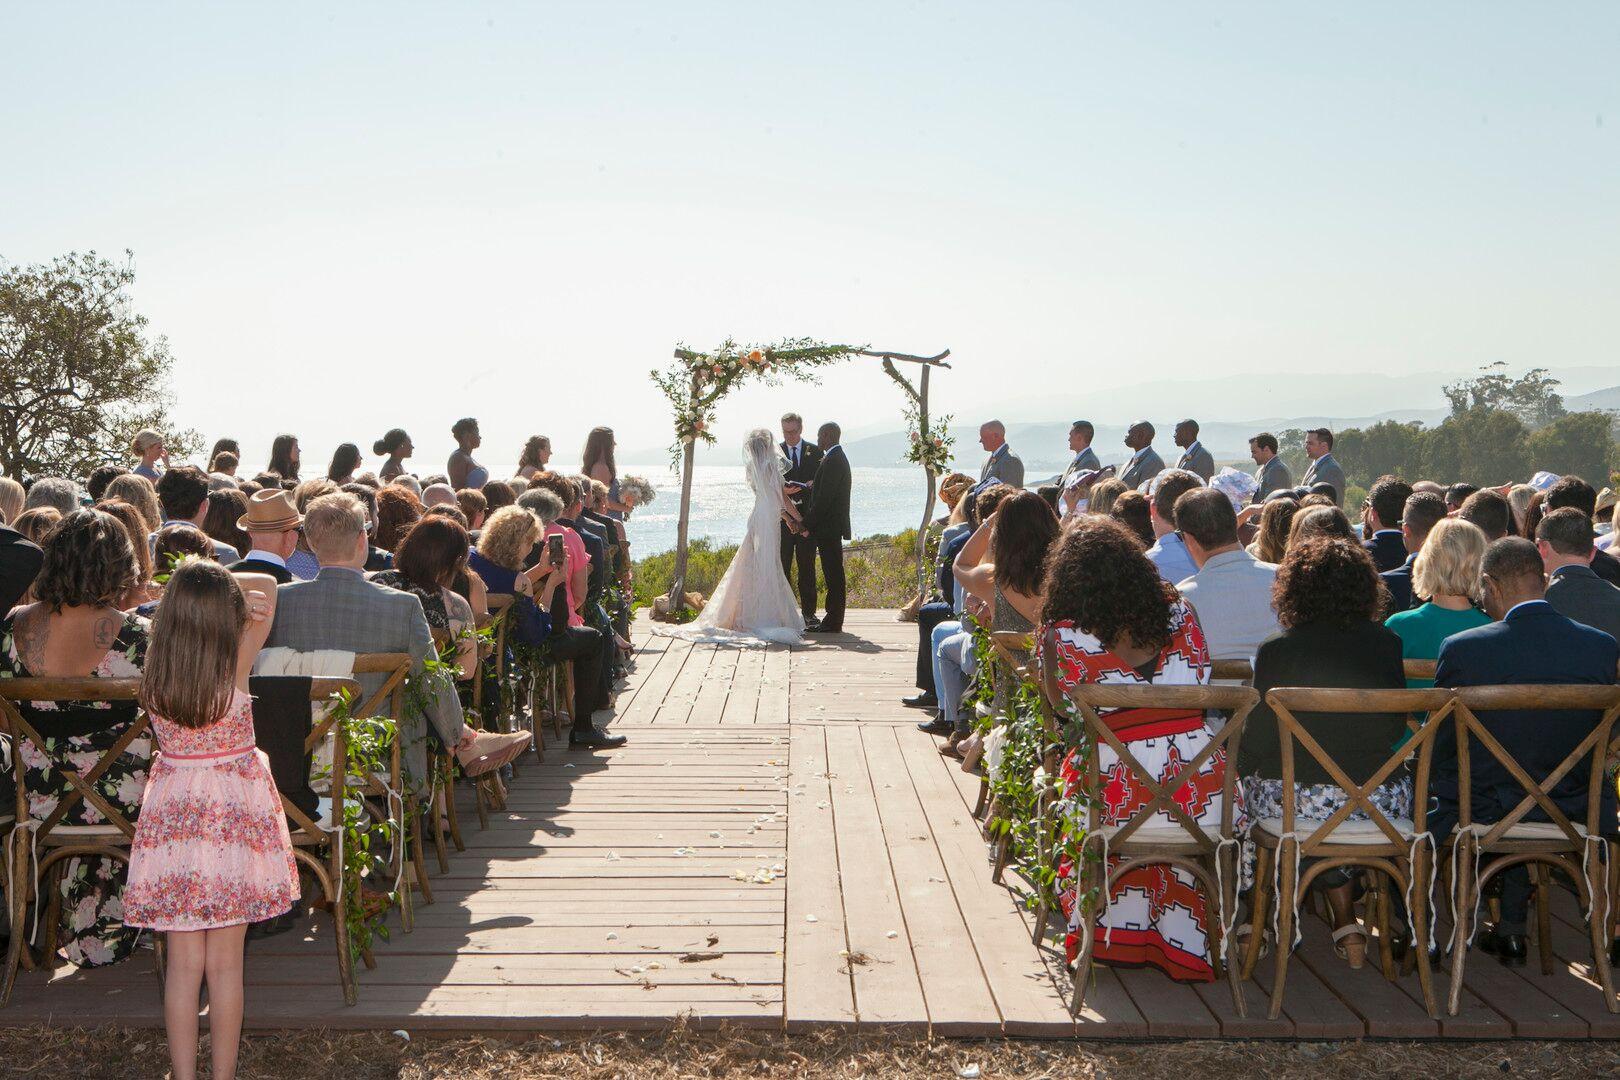 www.santabarbarawedding.com | Venue: Dos Pueblos Ranch | Photographer: ByCherry Photography | Event Designer: Elan Event Rentals | Florist: Tyler Speier | Wedding Ceremony